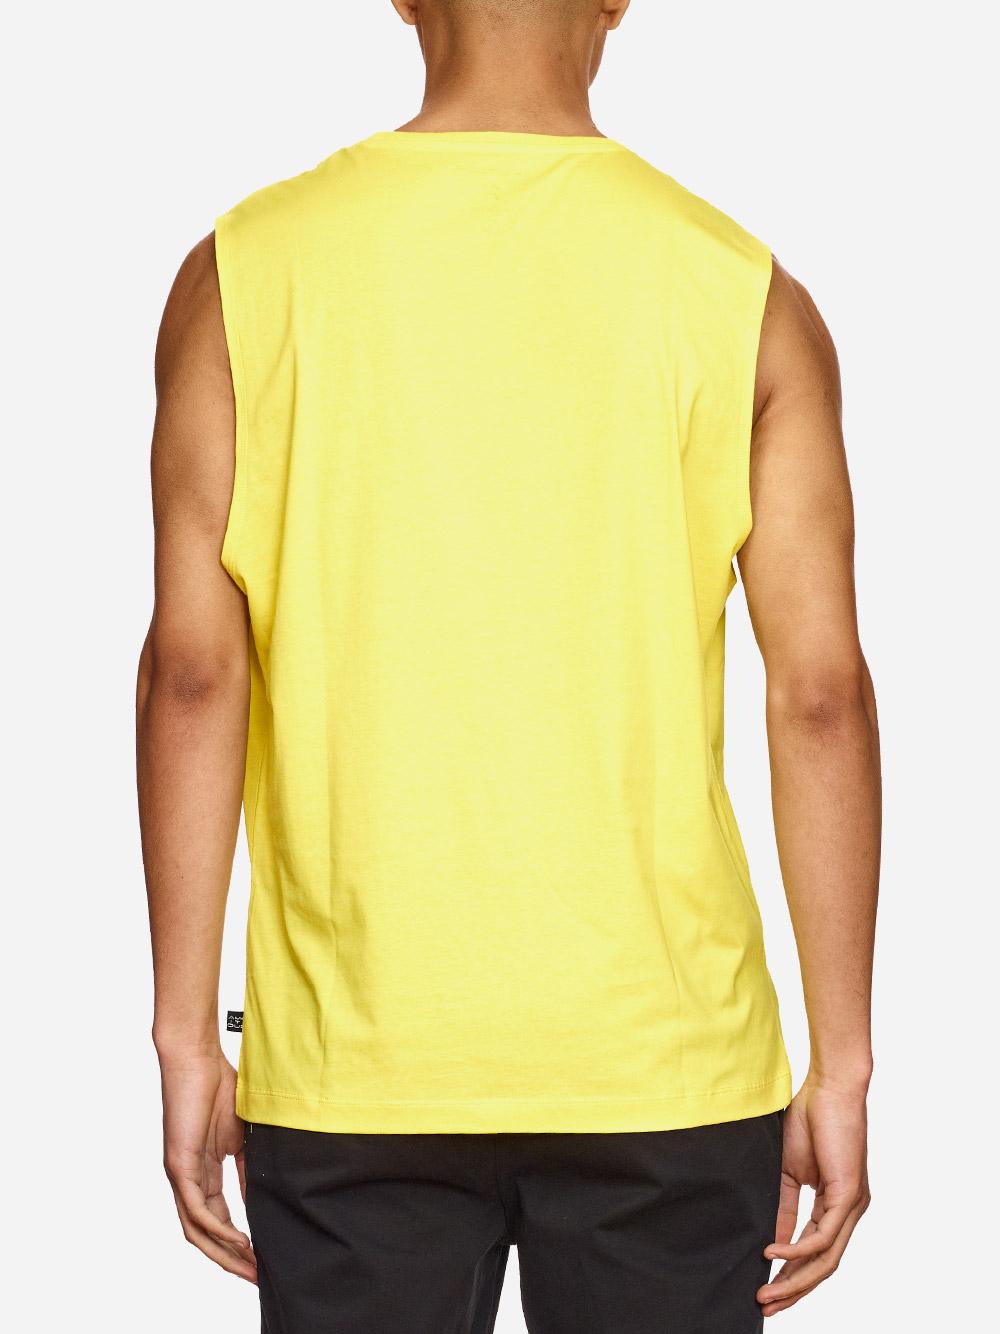 Printed Yellow Tank Top